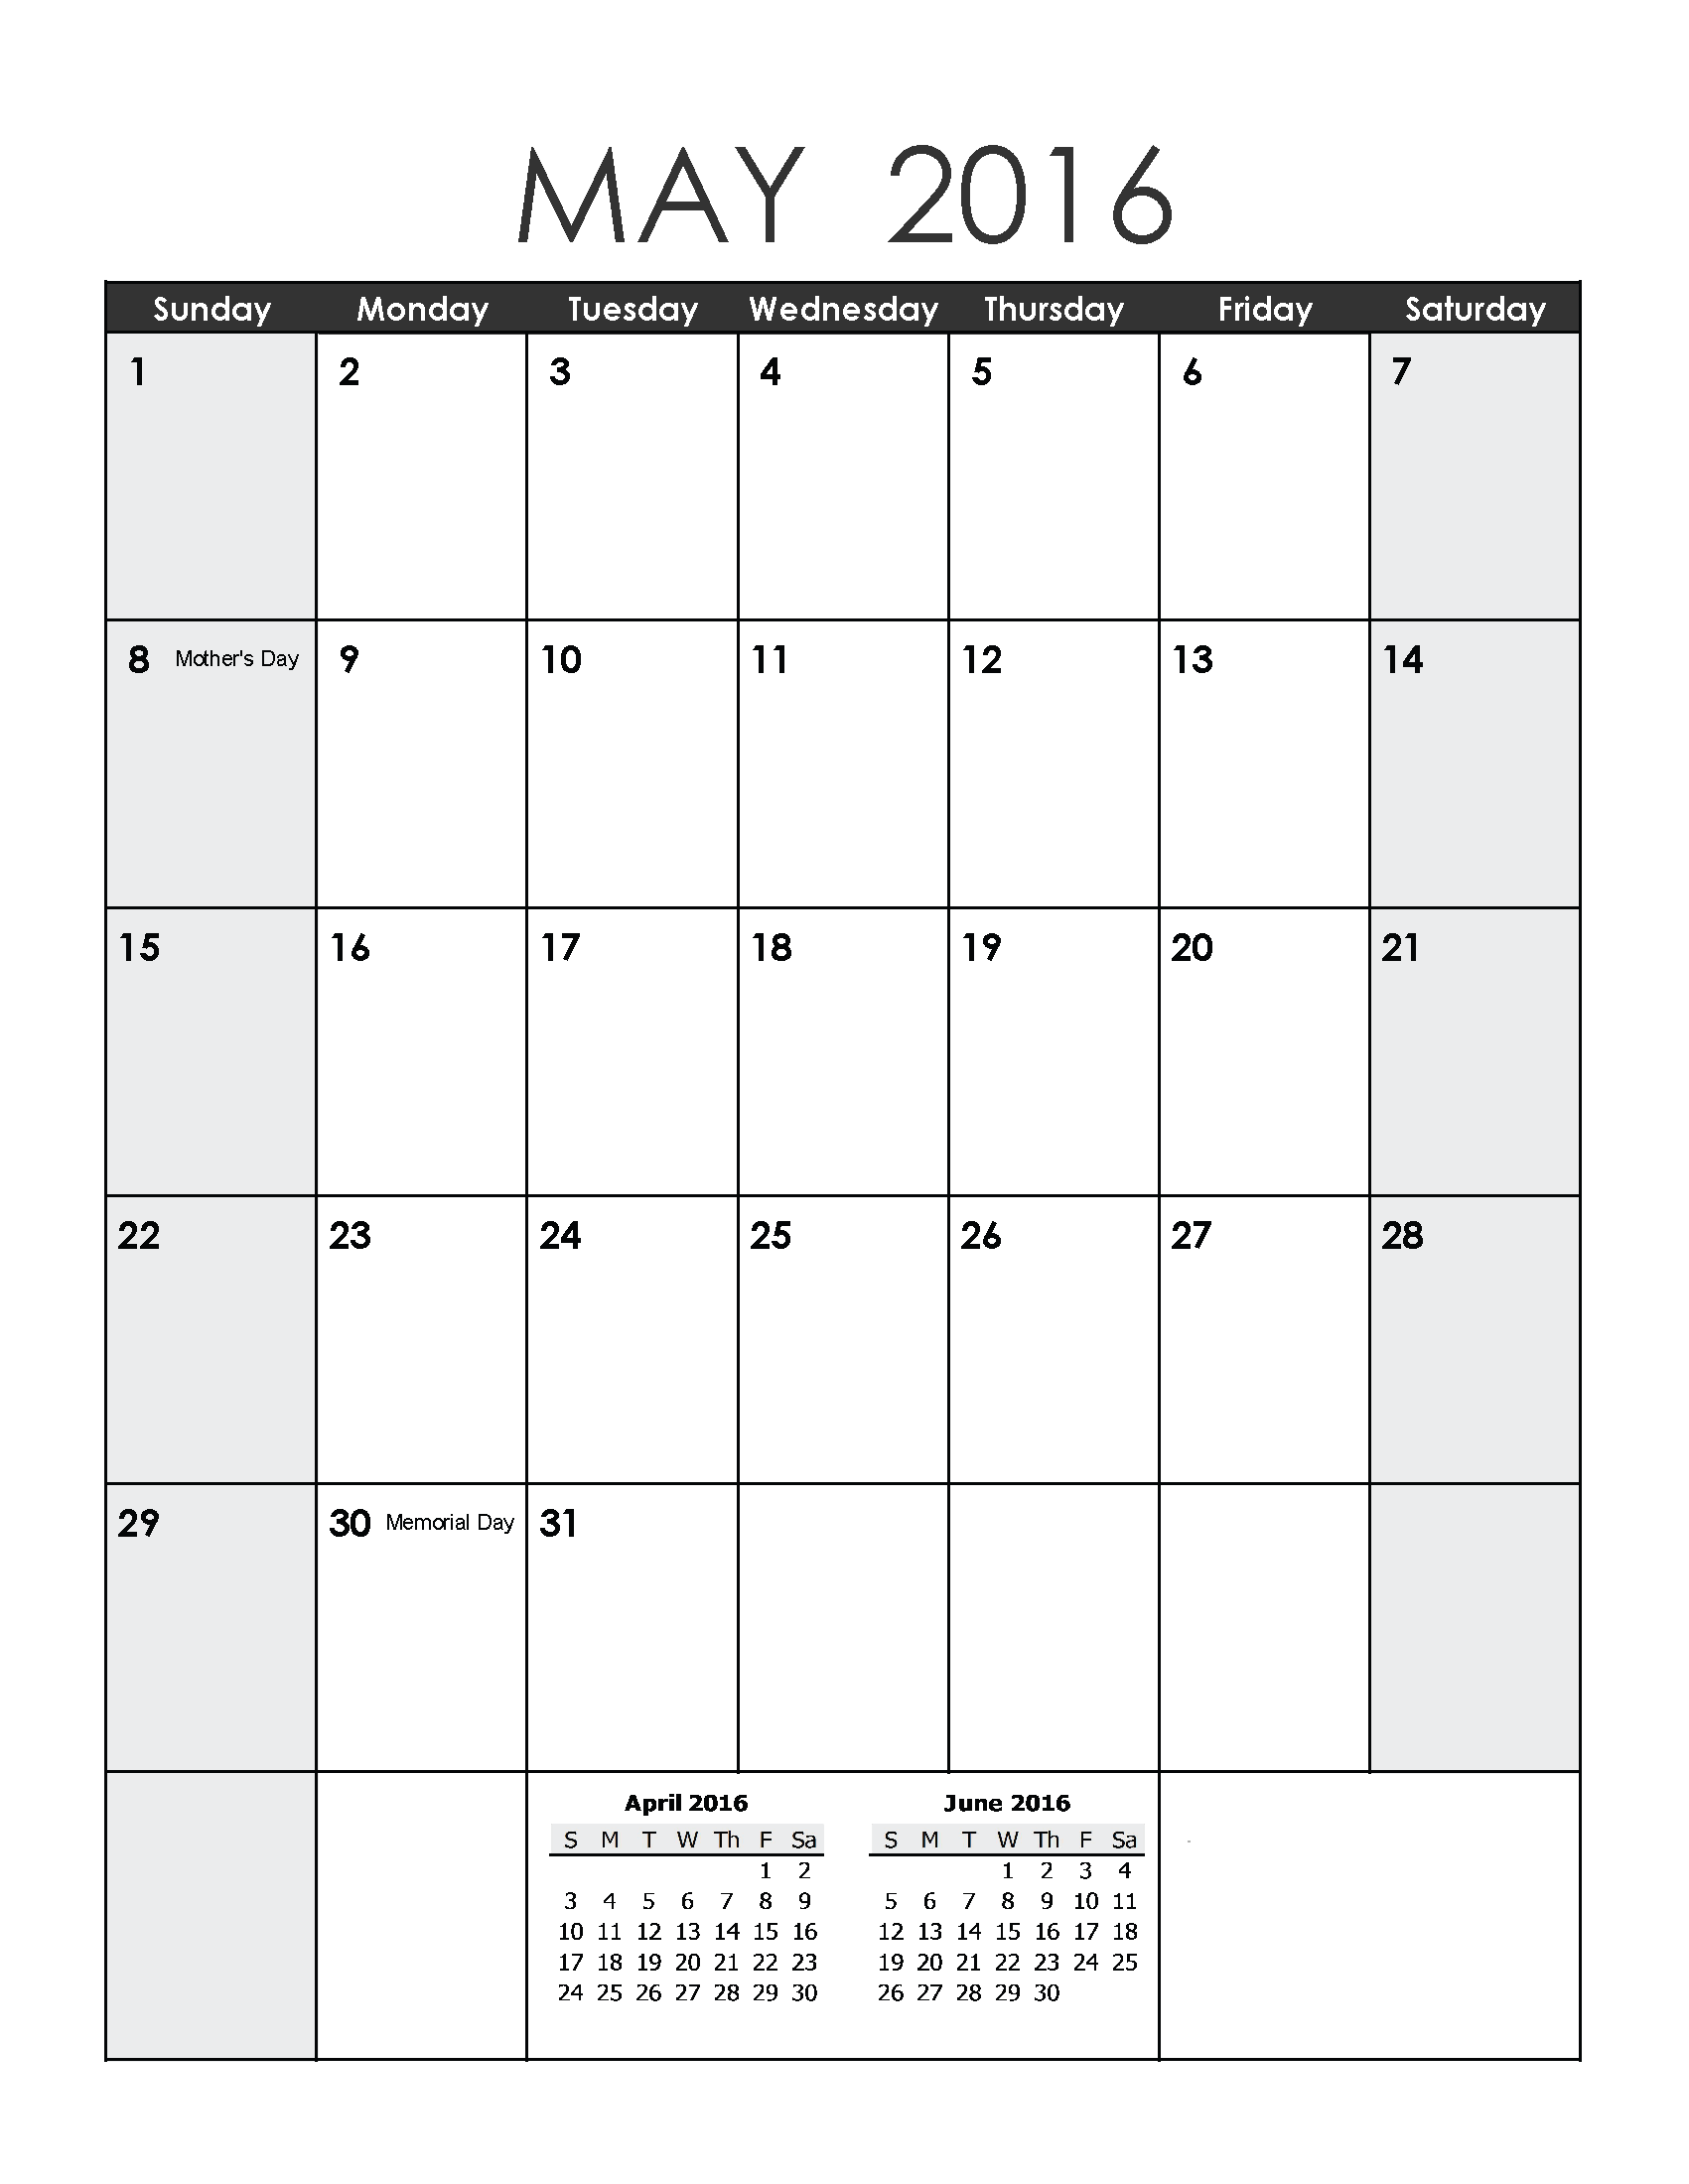 May 2016 Printable Calendar landscape, May 2016 Printable A4 Templates ...